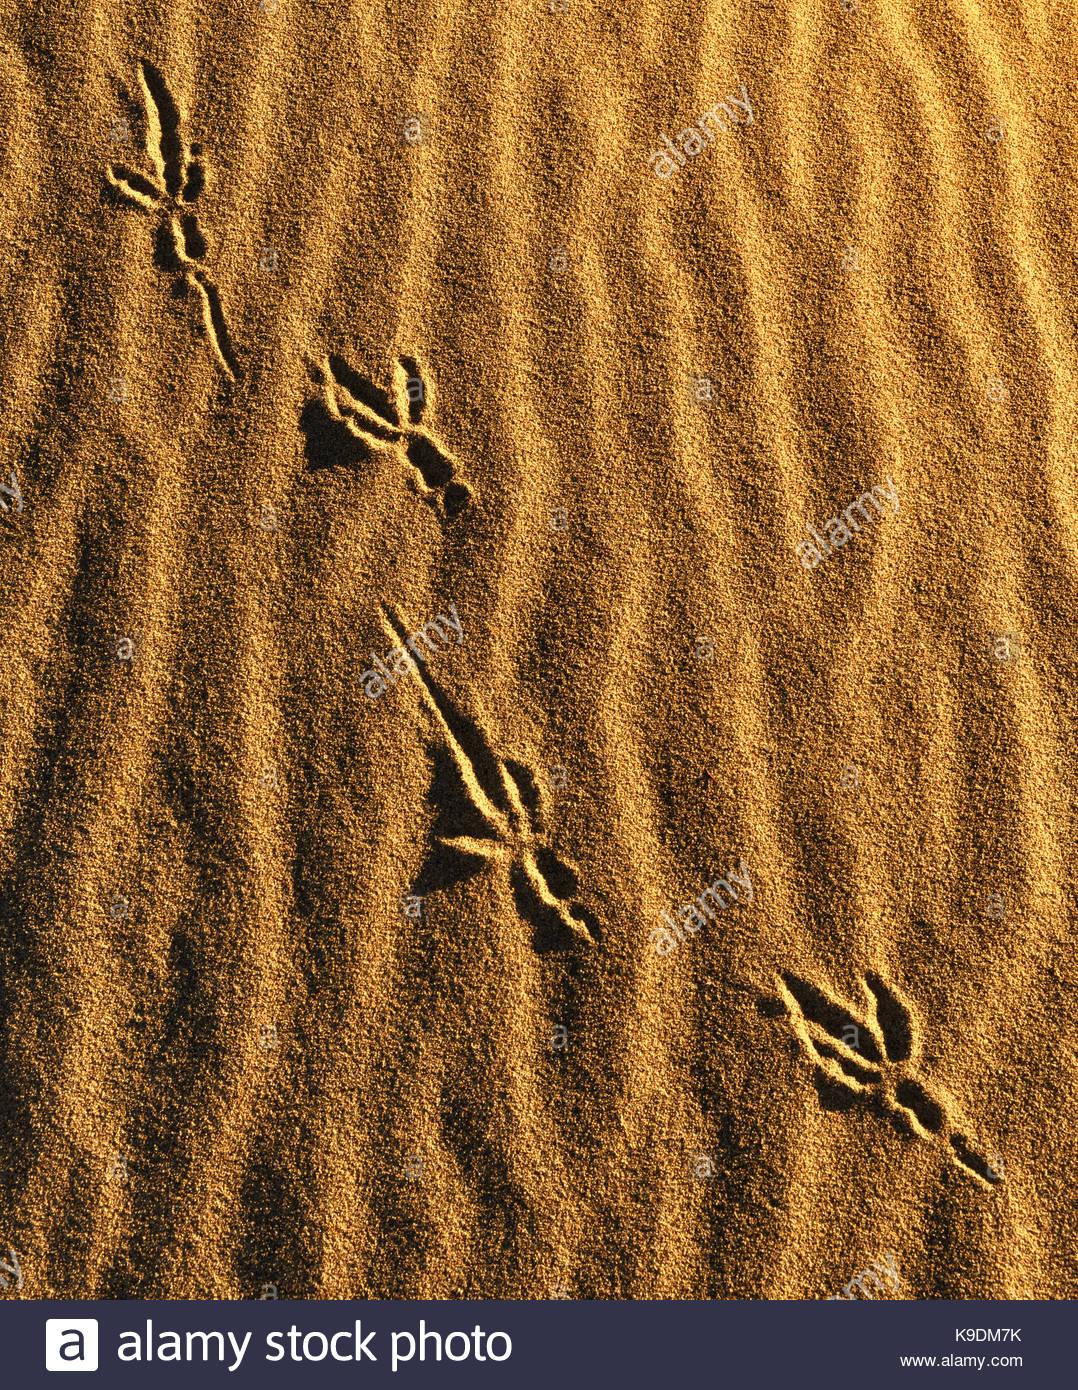 Raven Tracks on Sand Dune, Death Valley National Park, California - Stock Image